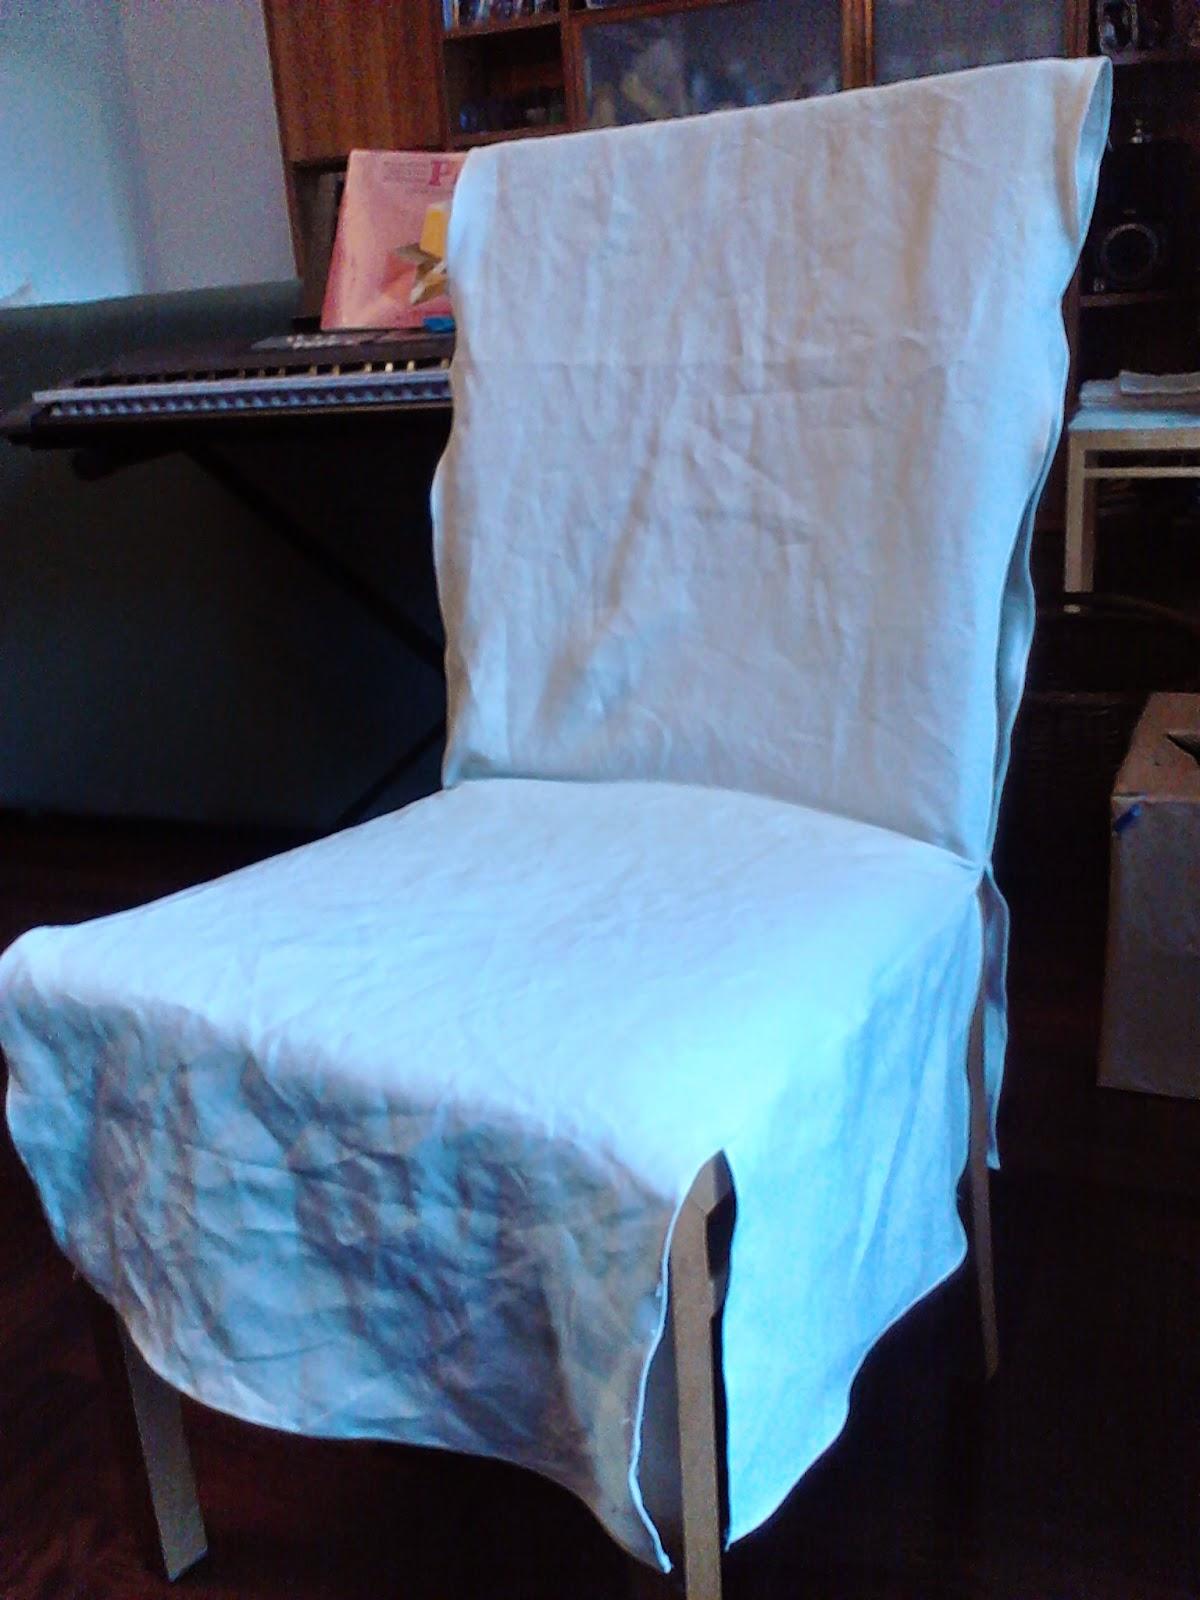 Favoloso Casalinga artigiana: Copri sedia facile fai da te - chair covers DIY QG23